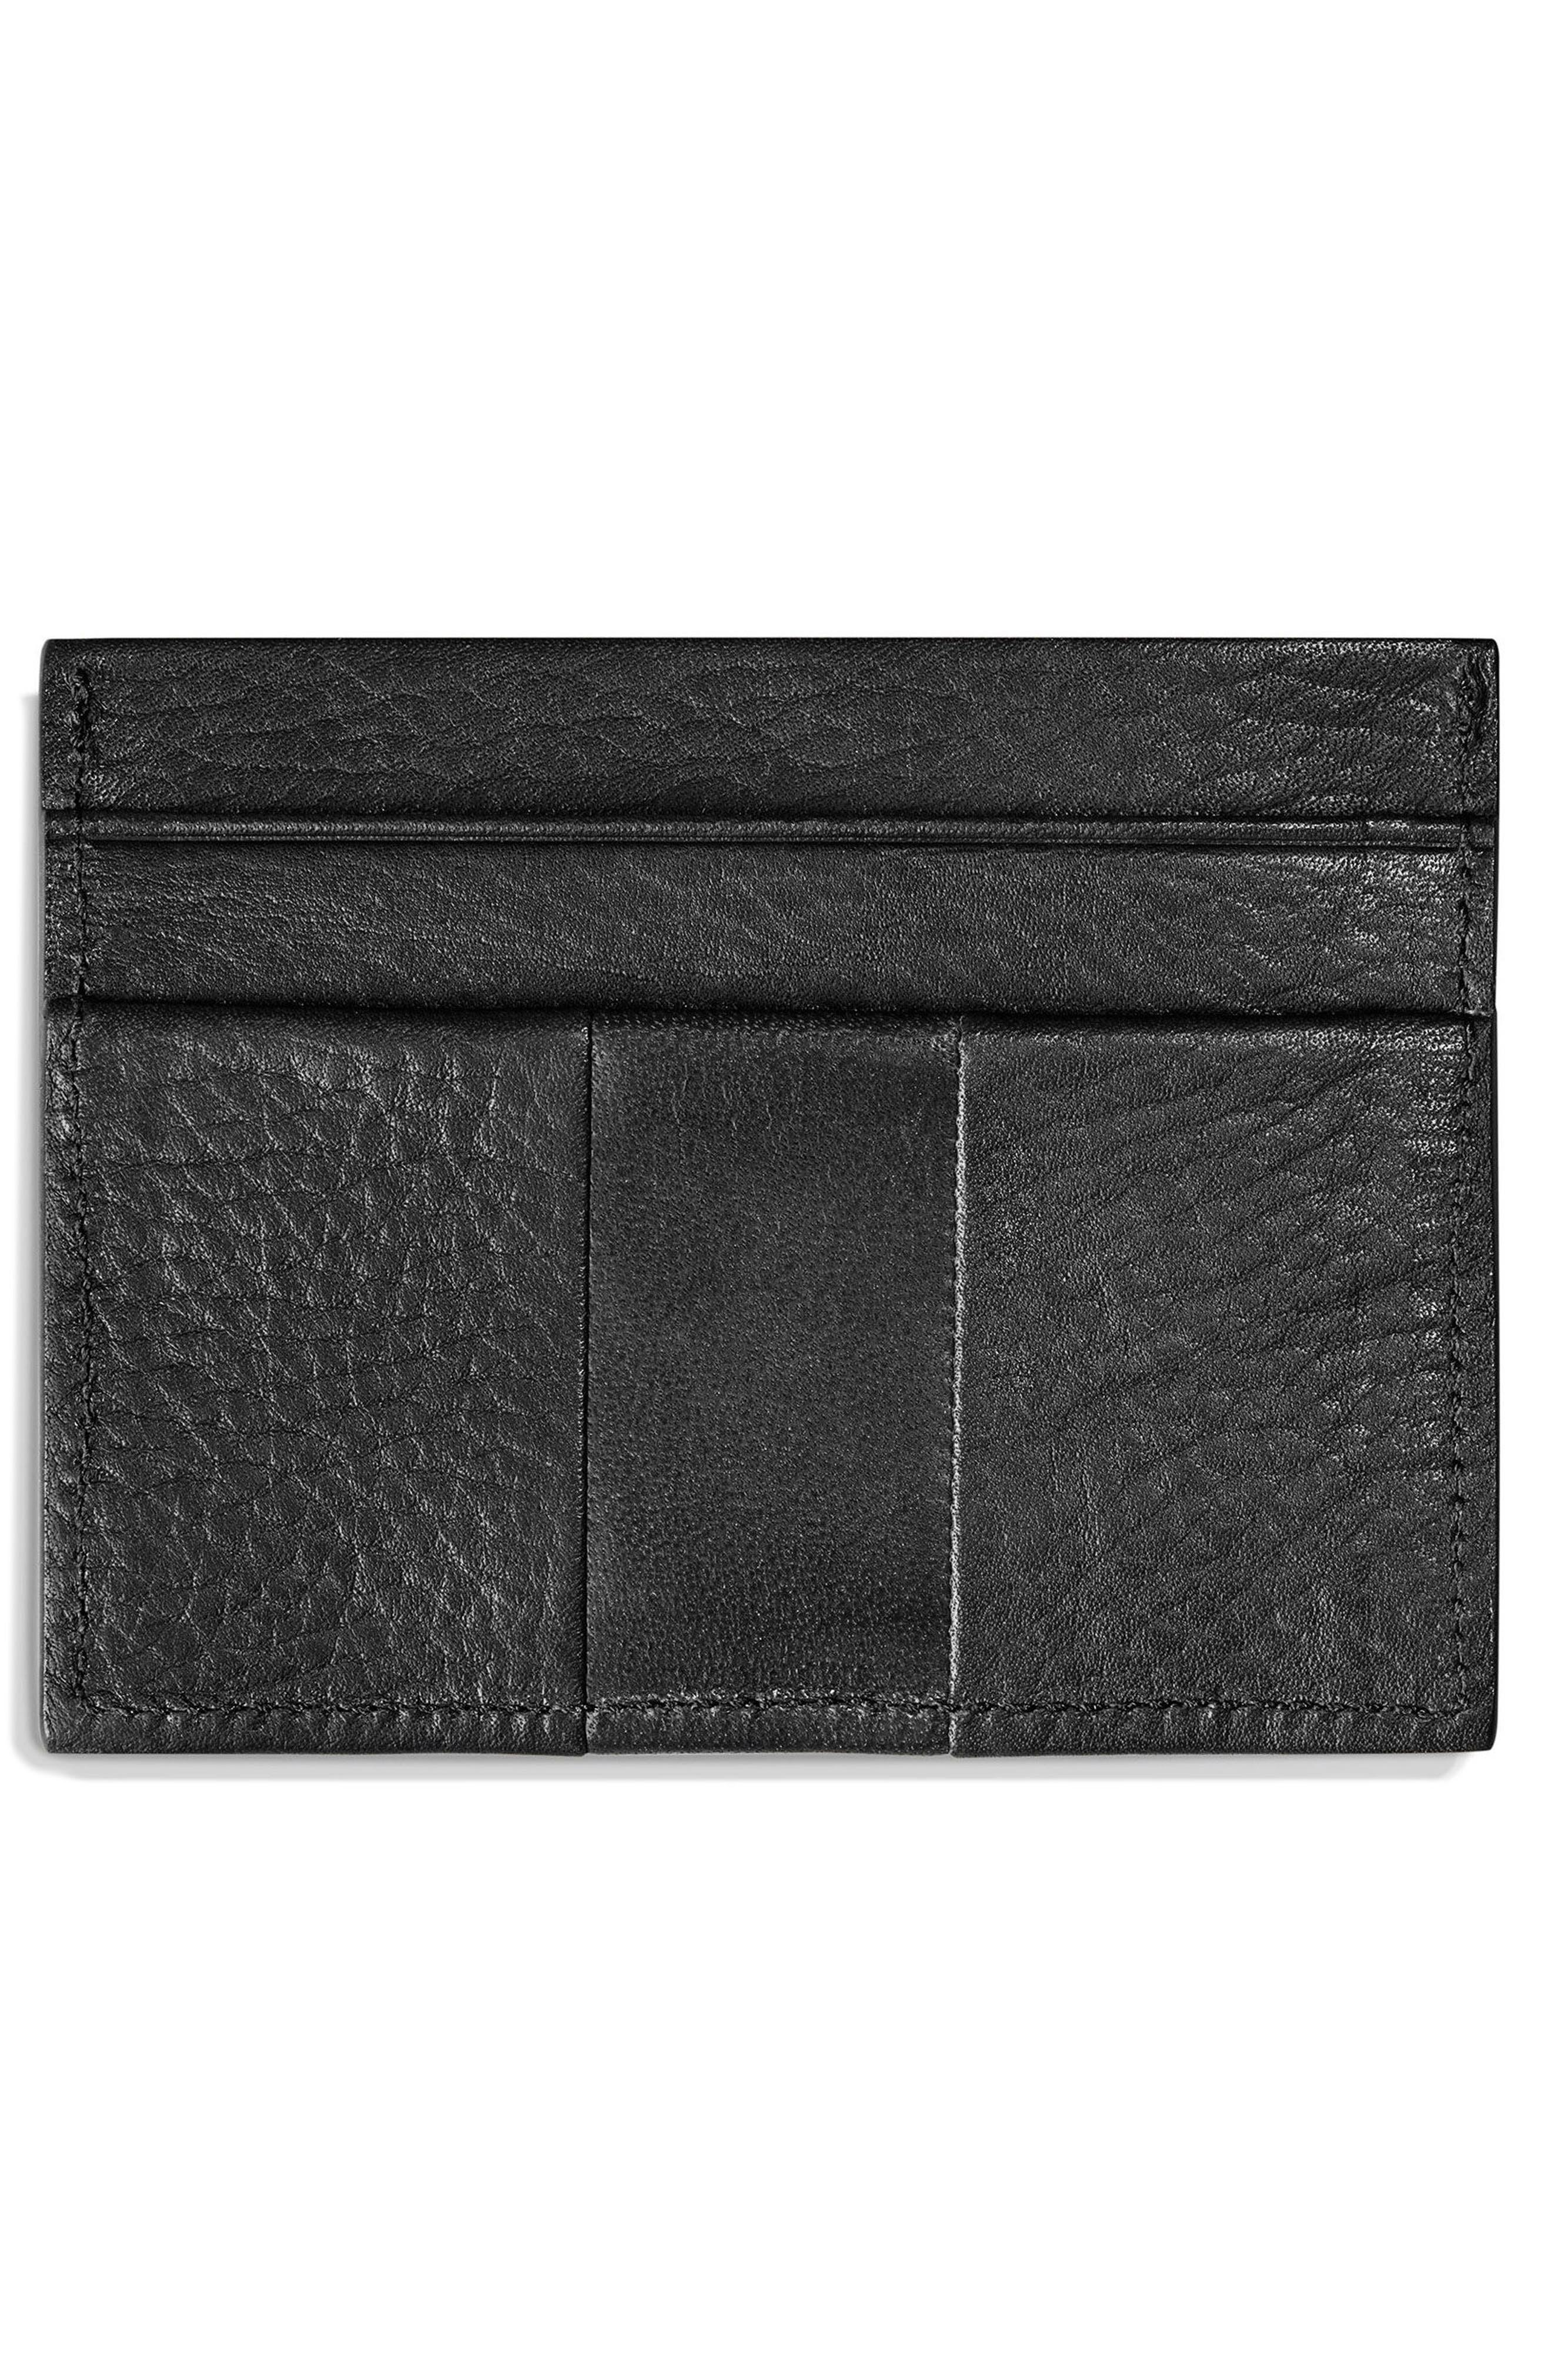 Bolt Leather Card Case,                             Alternate thumbnail 2, color,                             BLACK